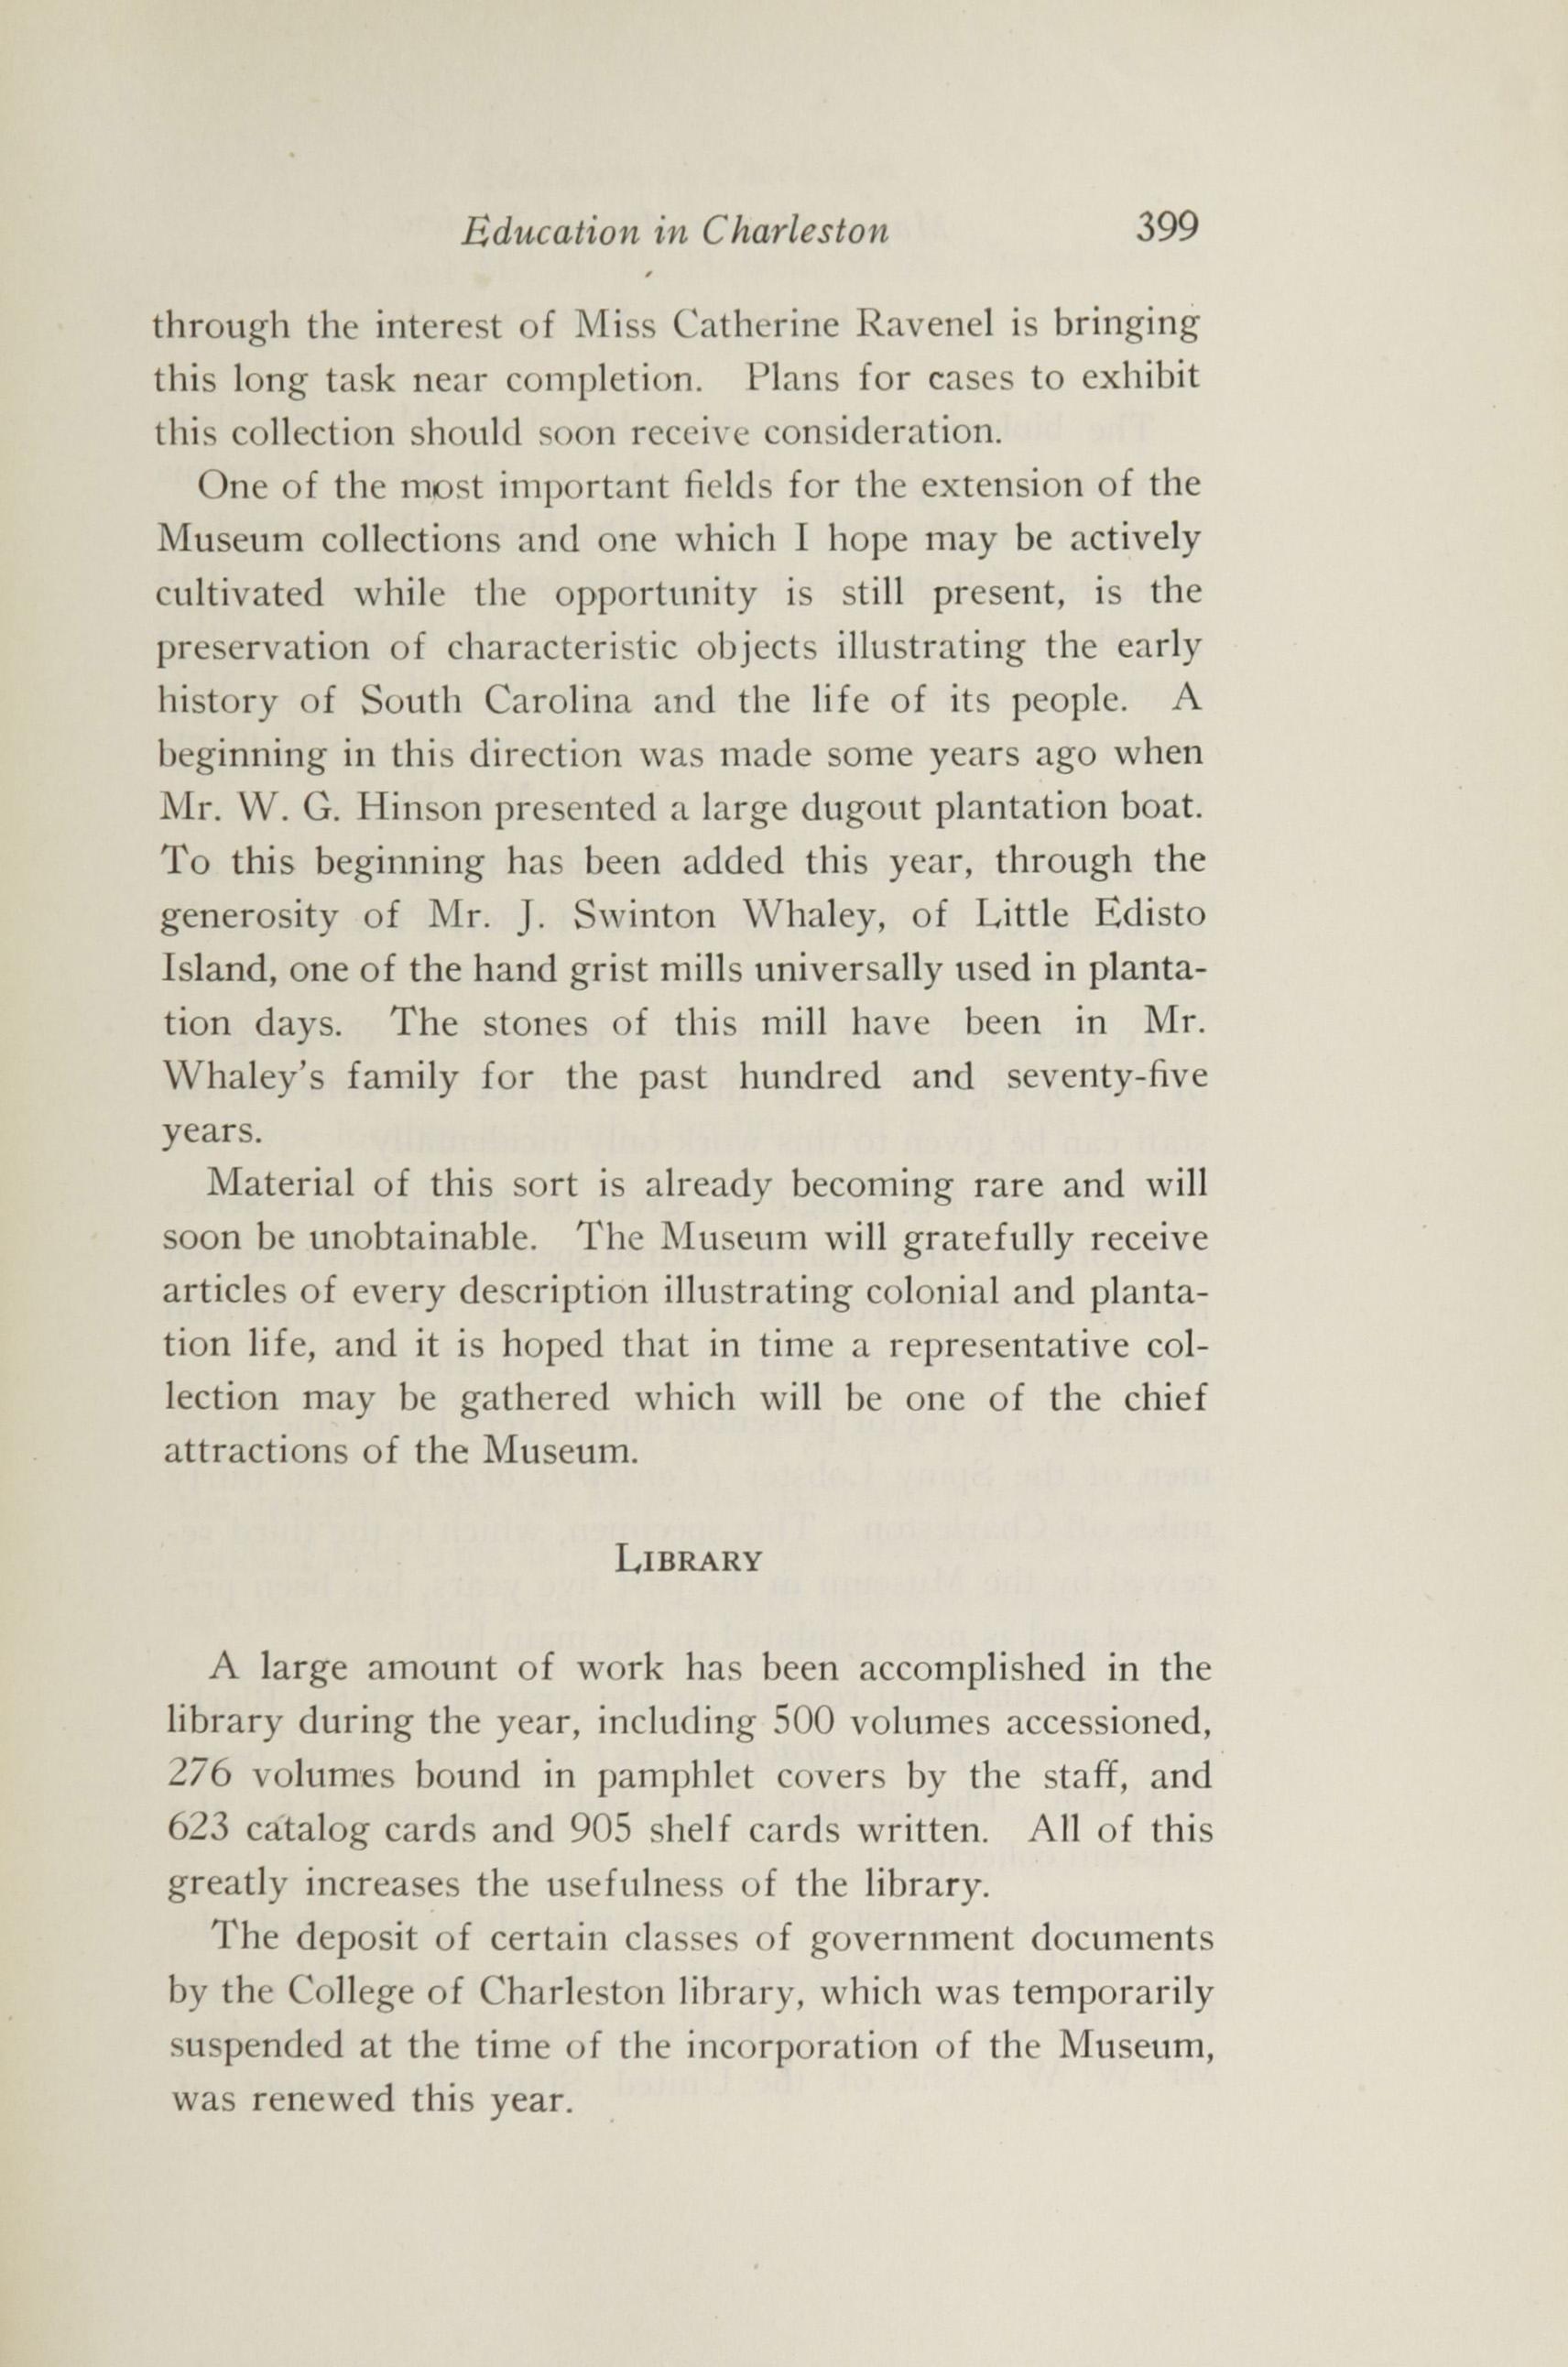 Charleston Yearbook, 1916, page 399